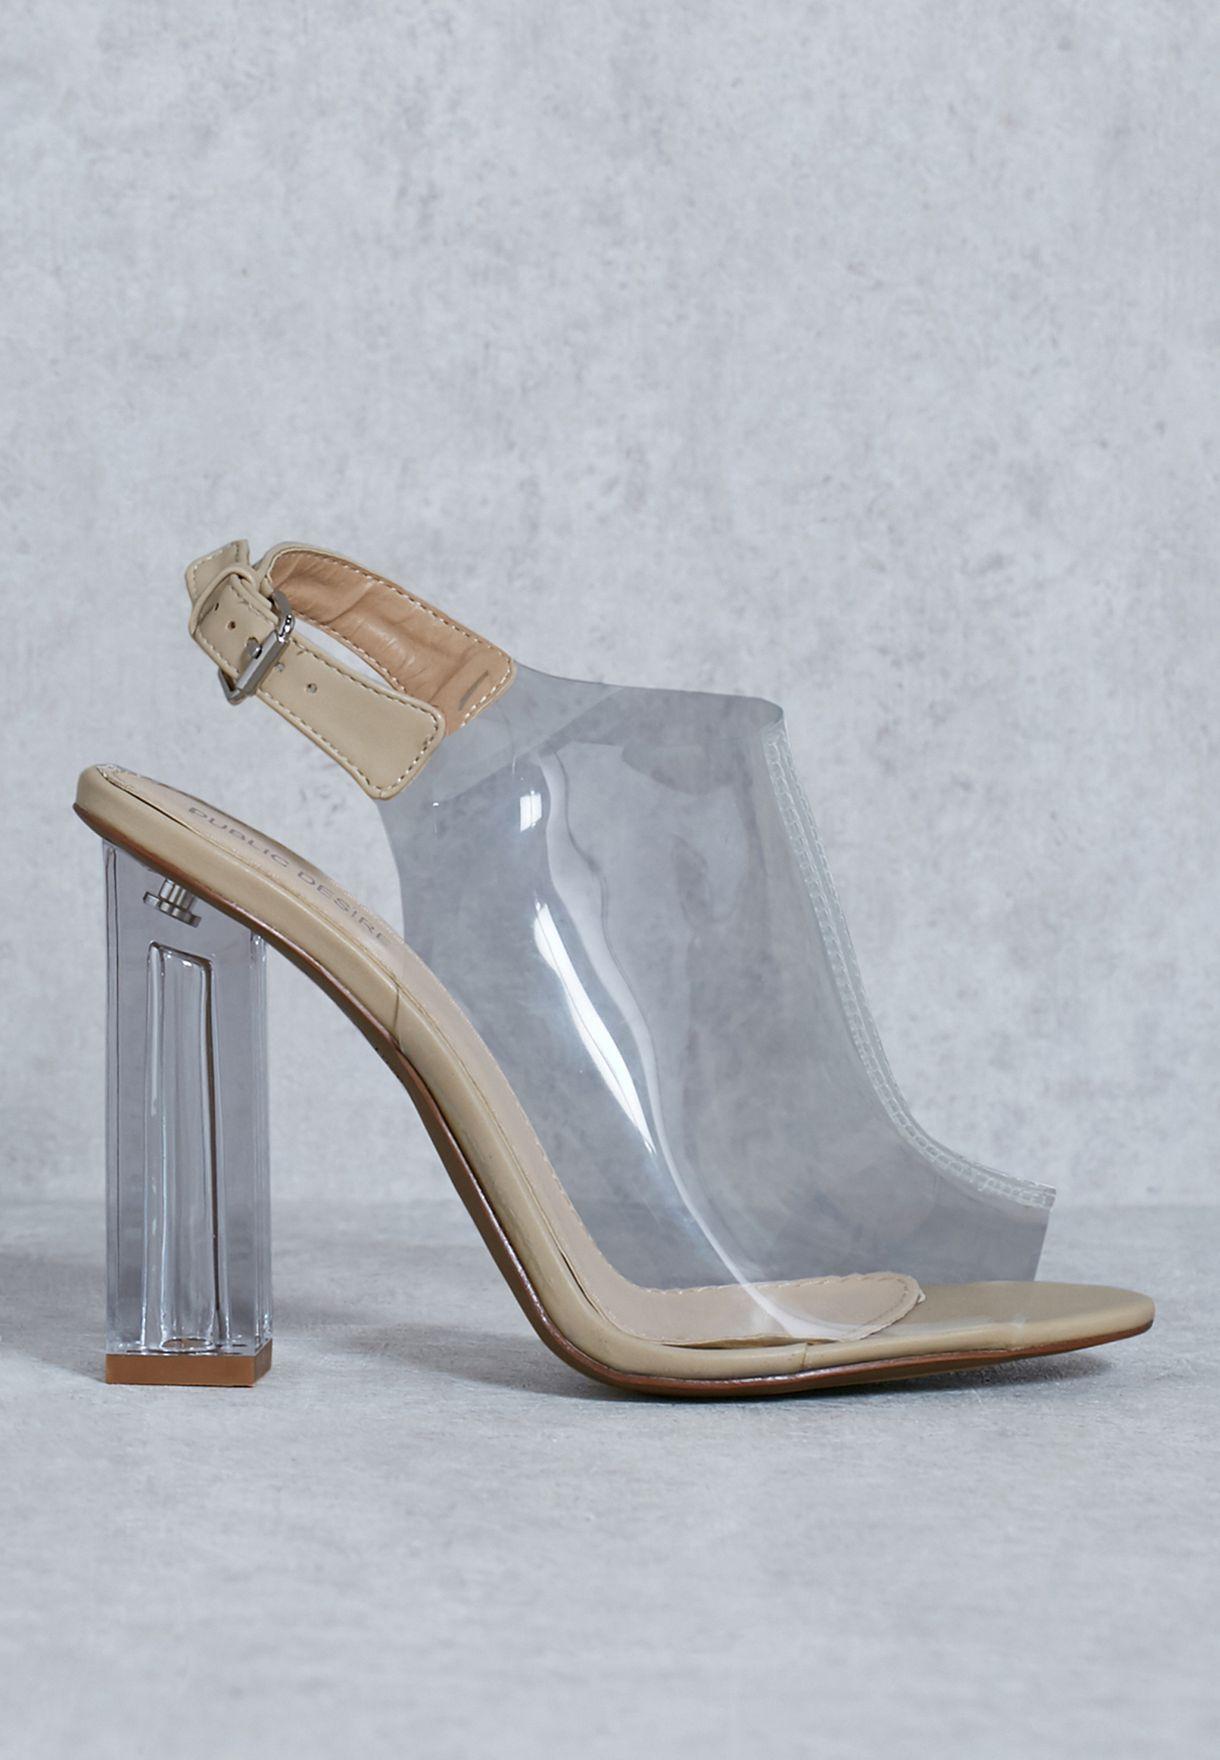 a97757dd505 Shop Public Desire neutrals Peeptoe Slingback Heeled Sandal KIMMY - 1 for  Women in Qatar - PU280SH80CBB